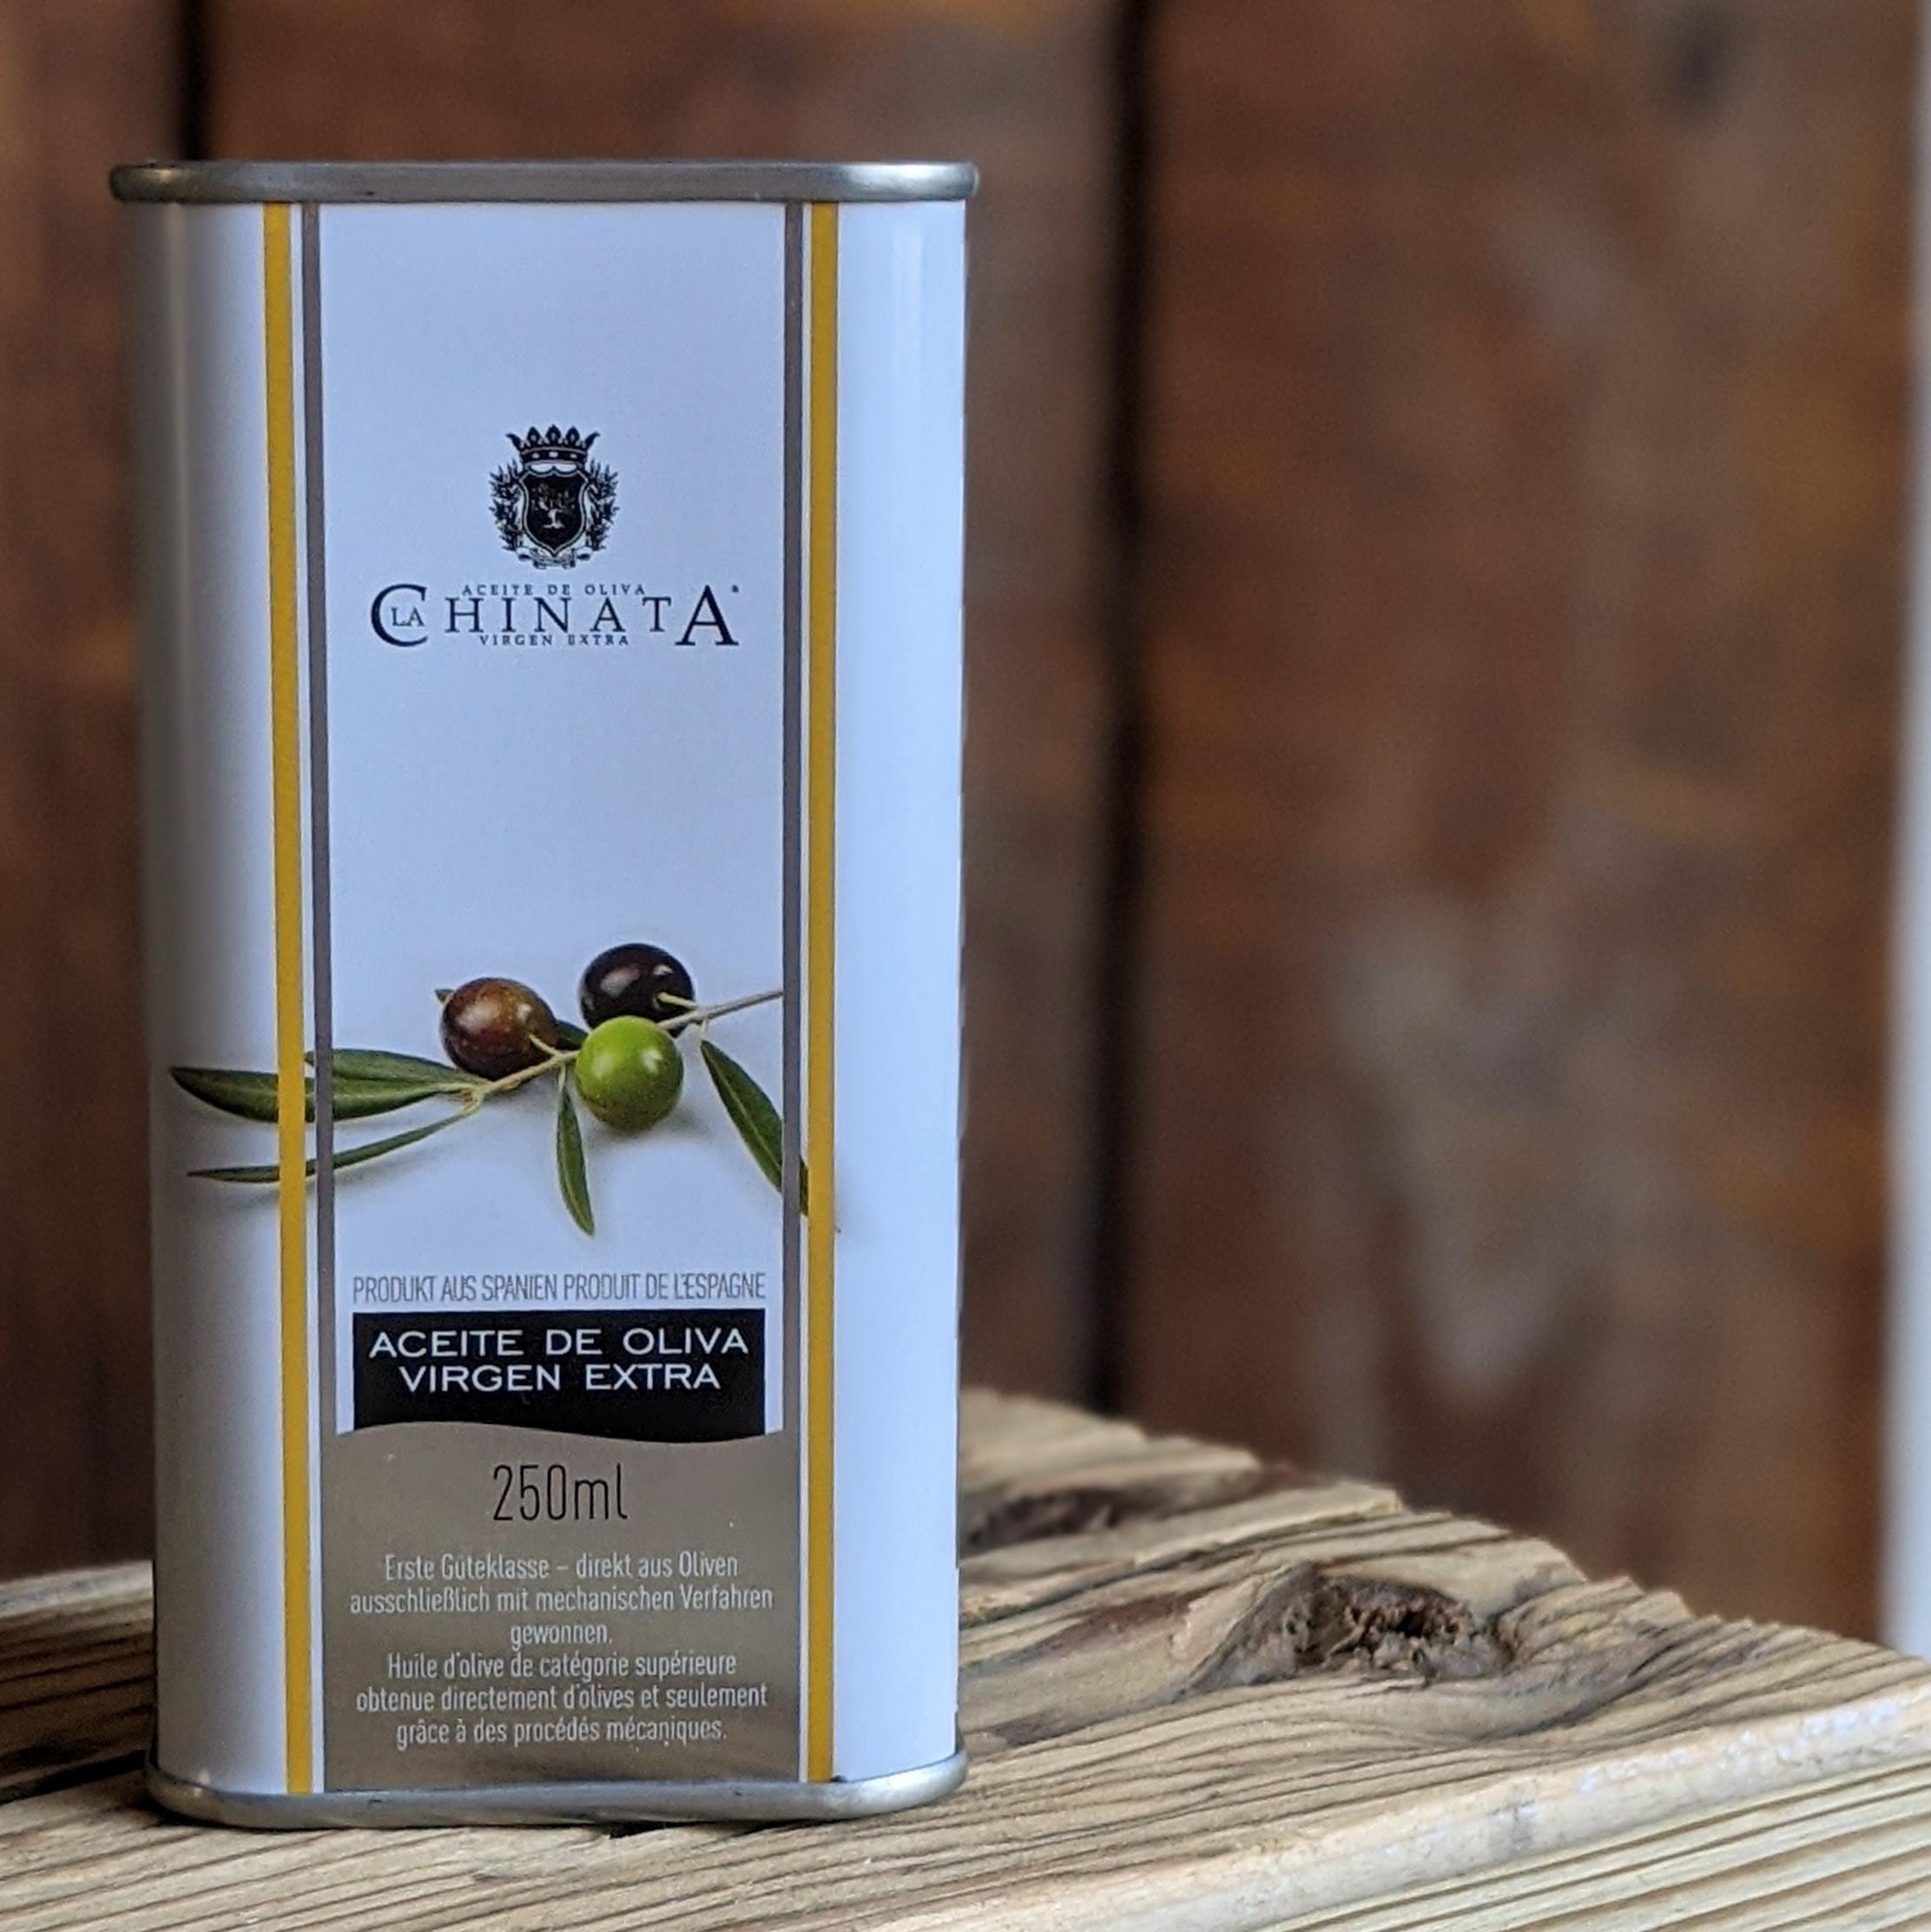 La Chinata Natives Olivenöl extra - in der Dose -  250ml